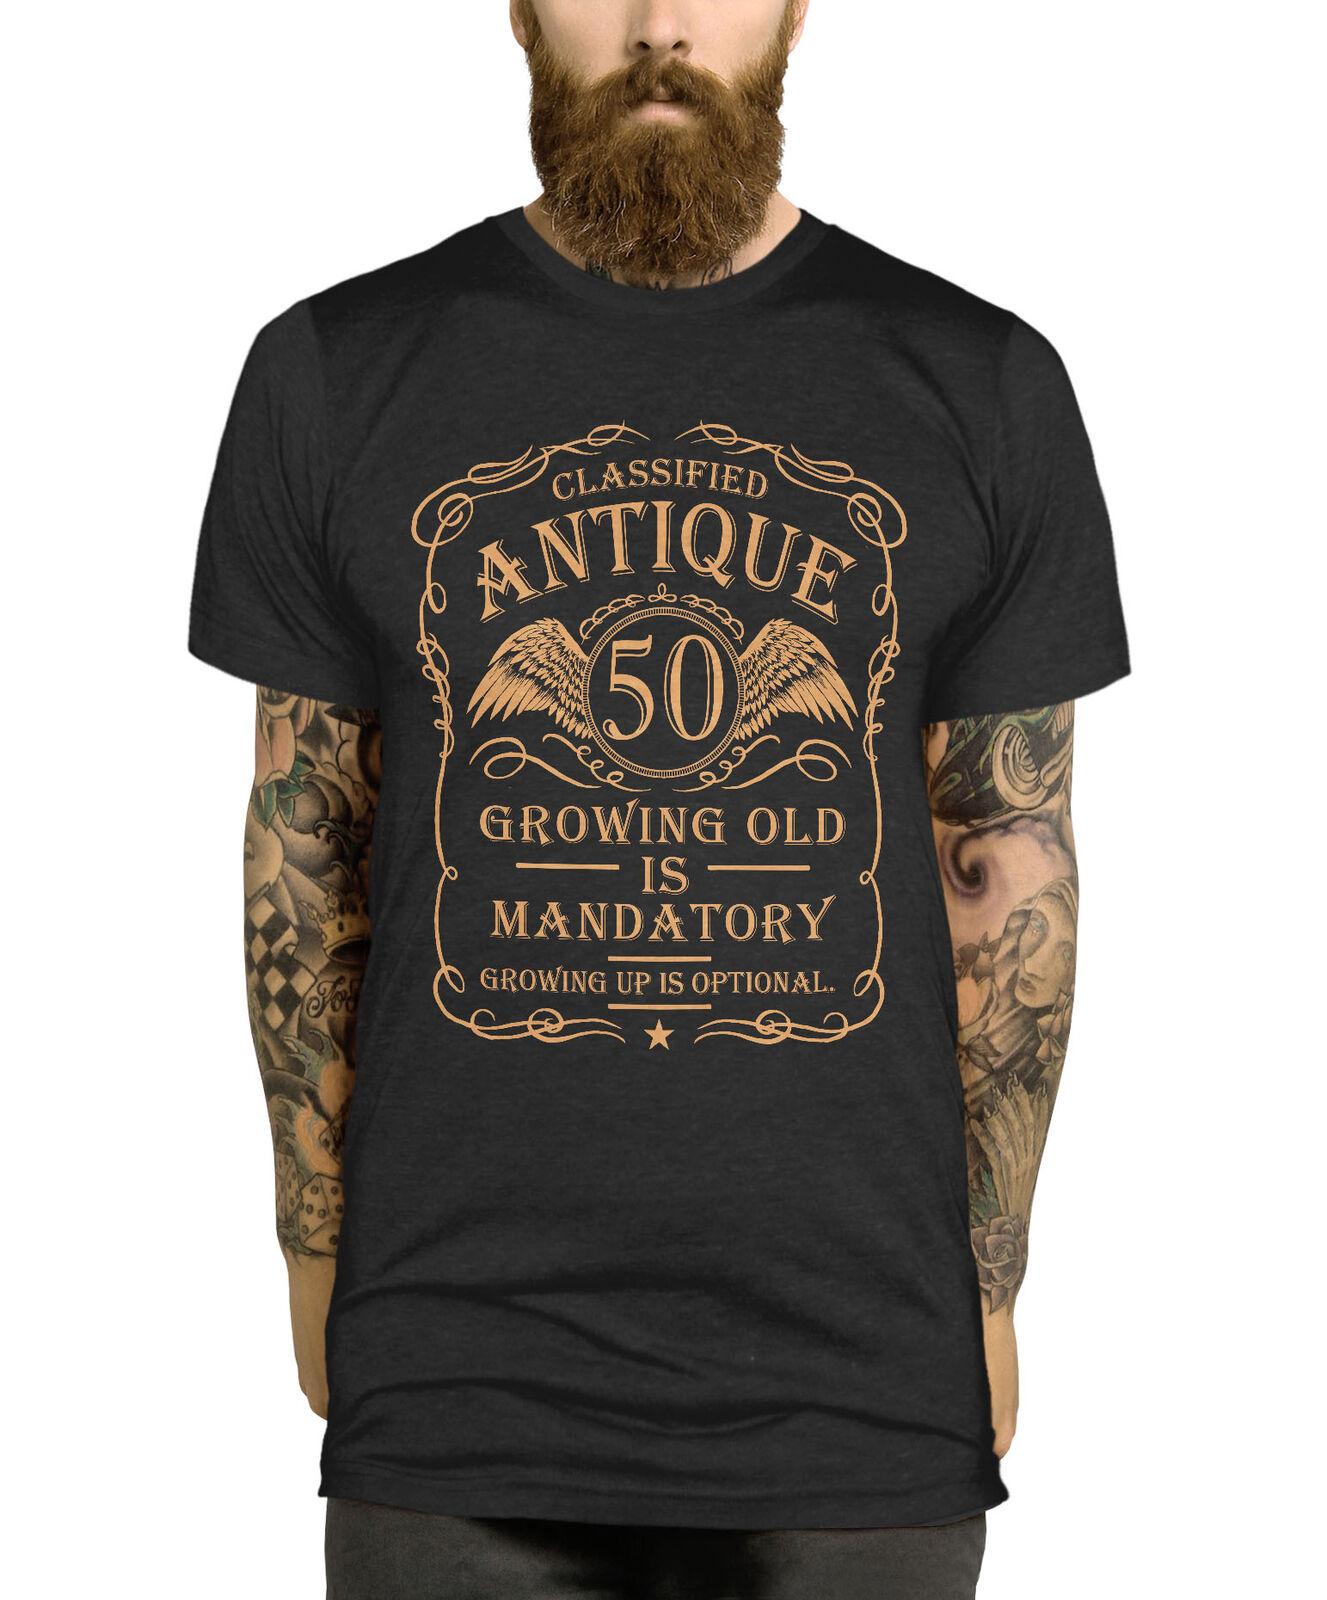 50th Birthday T Shirt Gift Idea For Men Funny Present